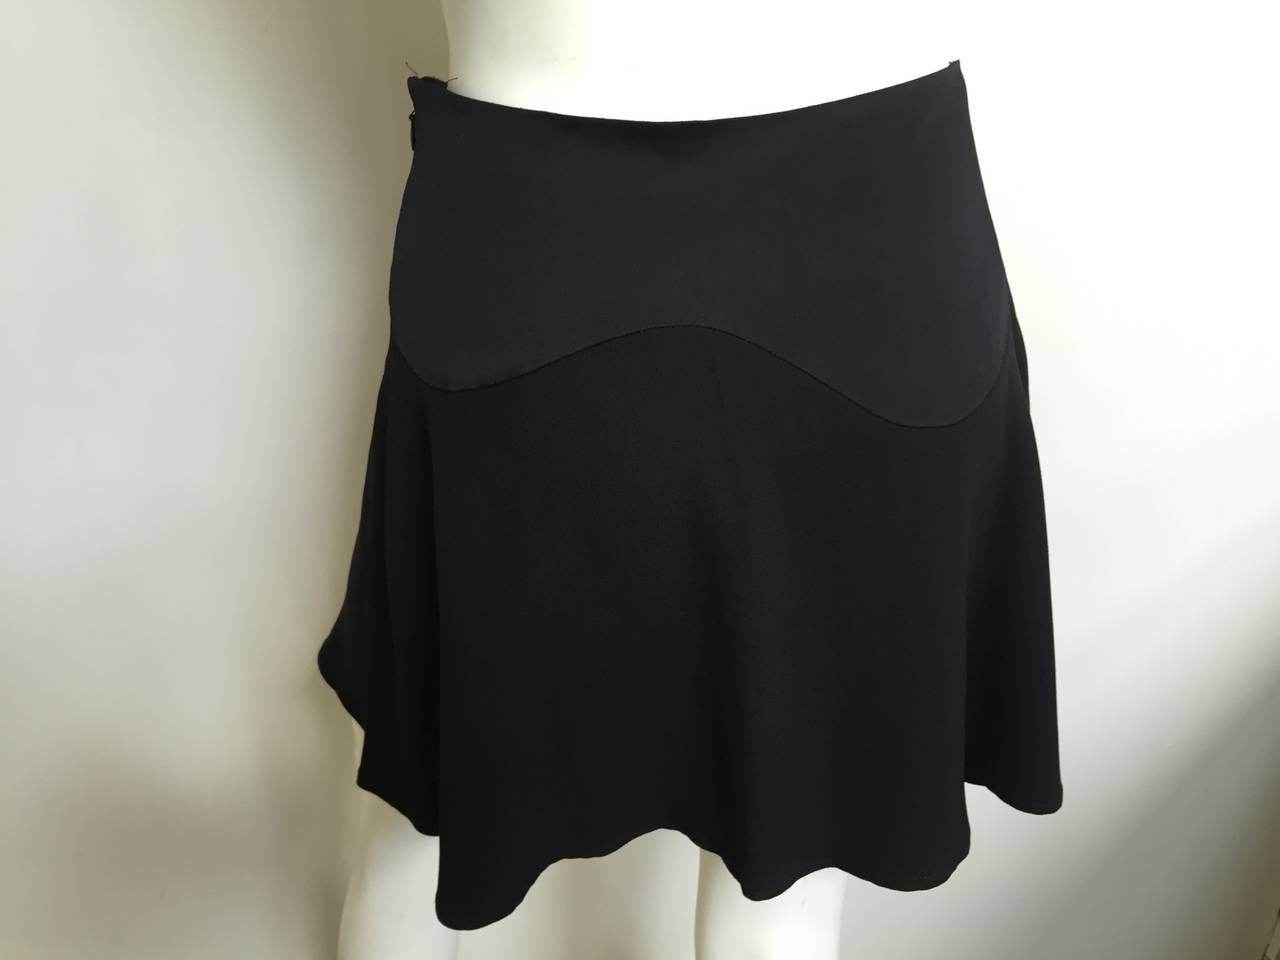 Moschino Black Short Skirt Size 6. 6